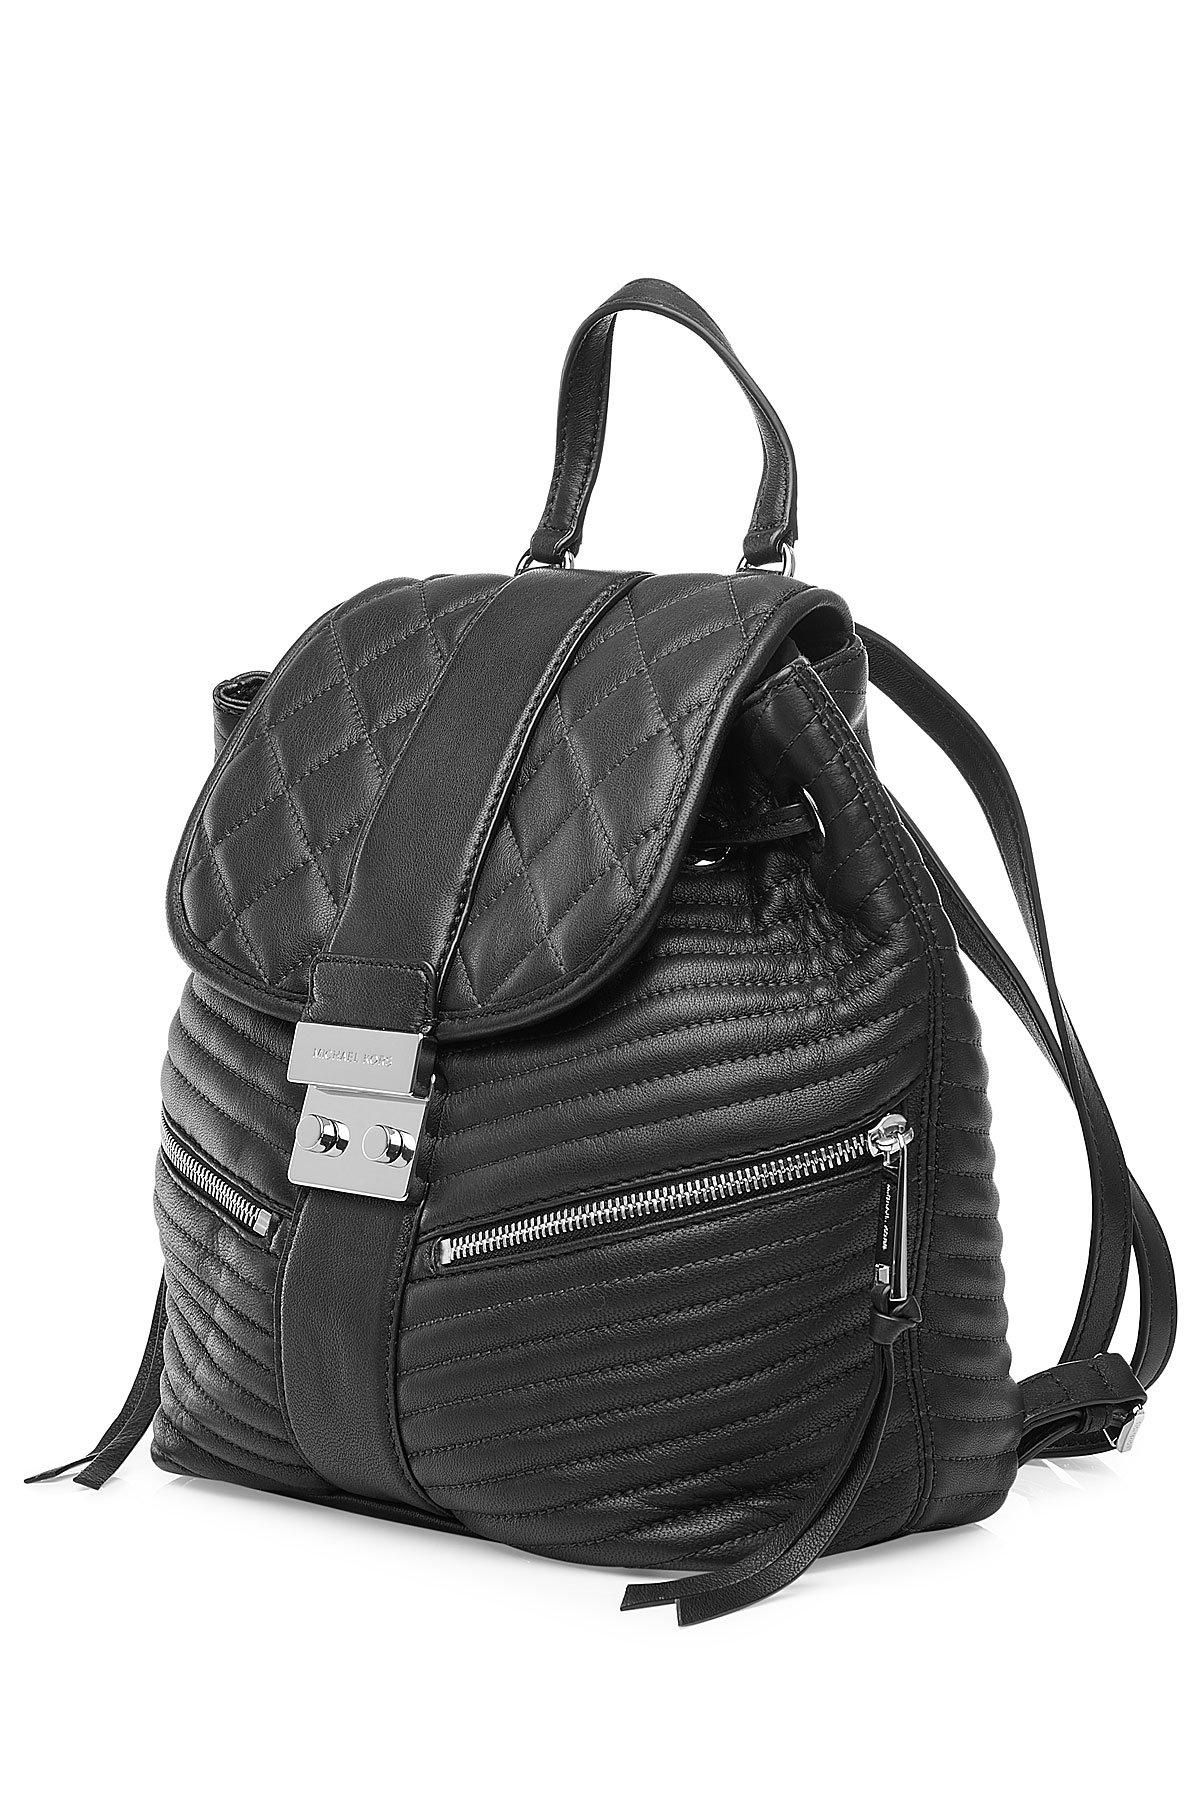 michael michael kors elisa small leather backpack black in black lyst. Black Bedroom Furniture Sets. Home Design Ideas